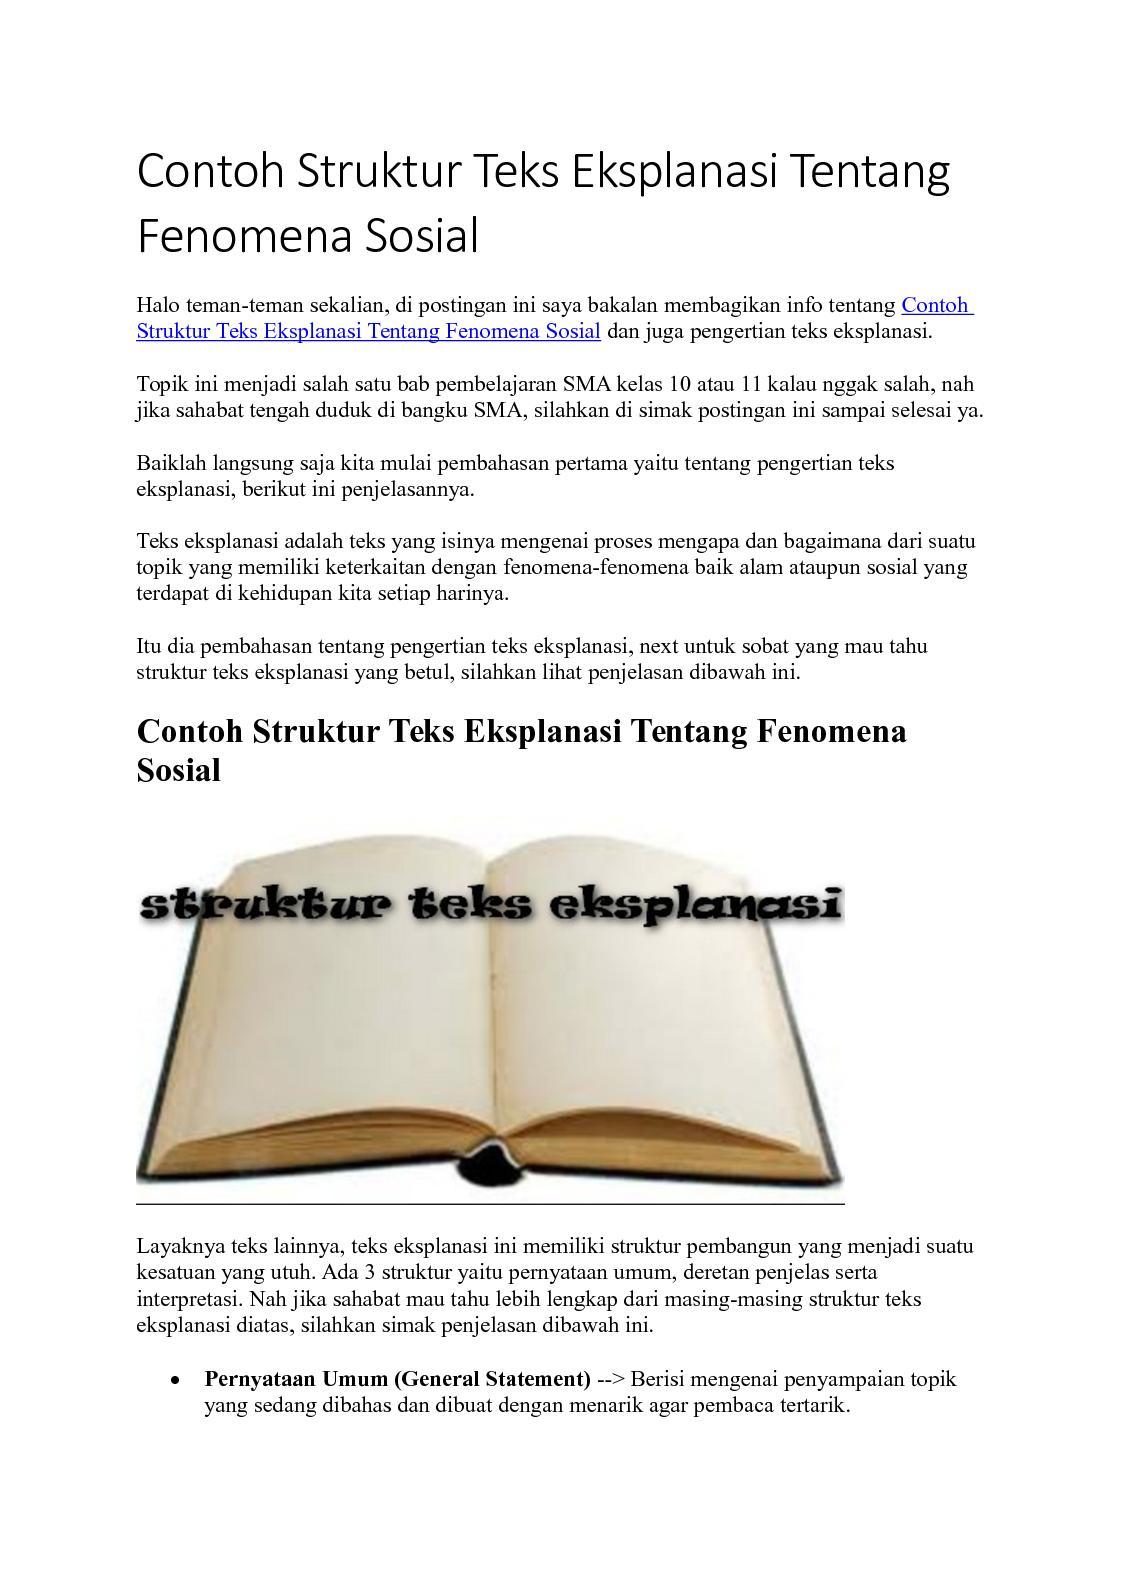 Contoh Teks Eksplanasi Fenomena Sosial : contoh, eksplanasi, fenomena, sosial, Calaméo, Contoh, Struktur, Eksplanasi, Tentang, Fenomena, Sosial